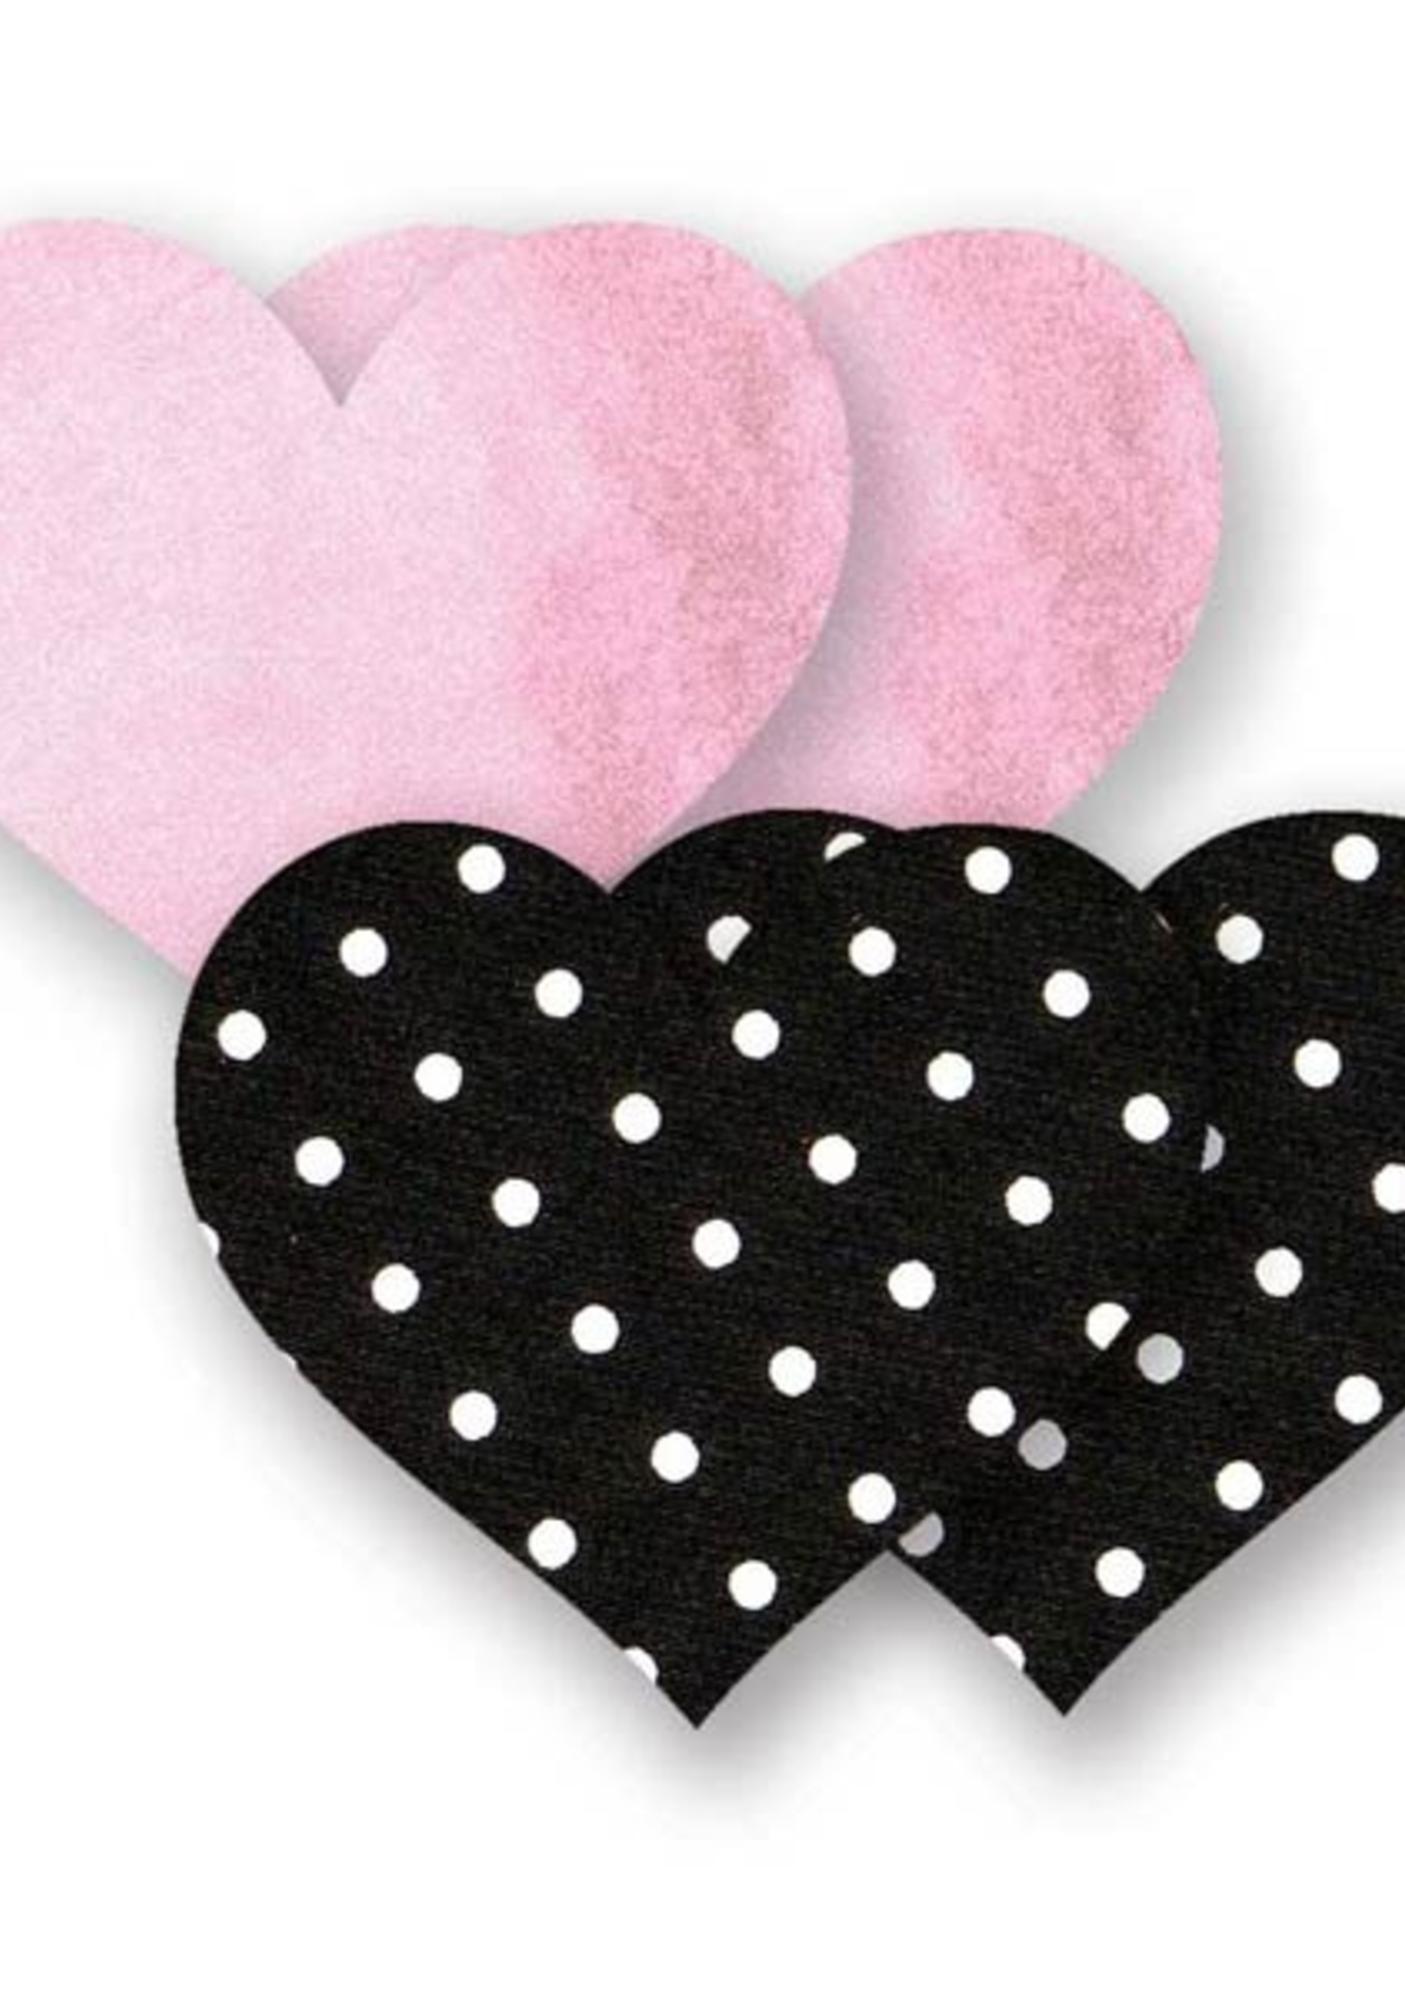 Bristols Six Pretty in Pink Heart Nippie